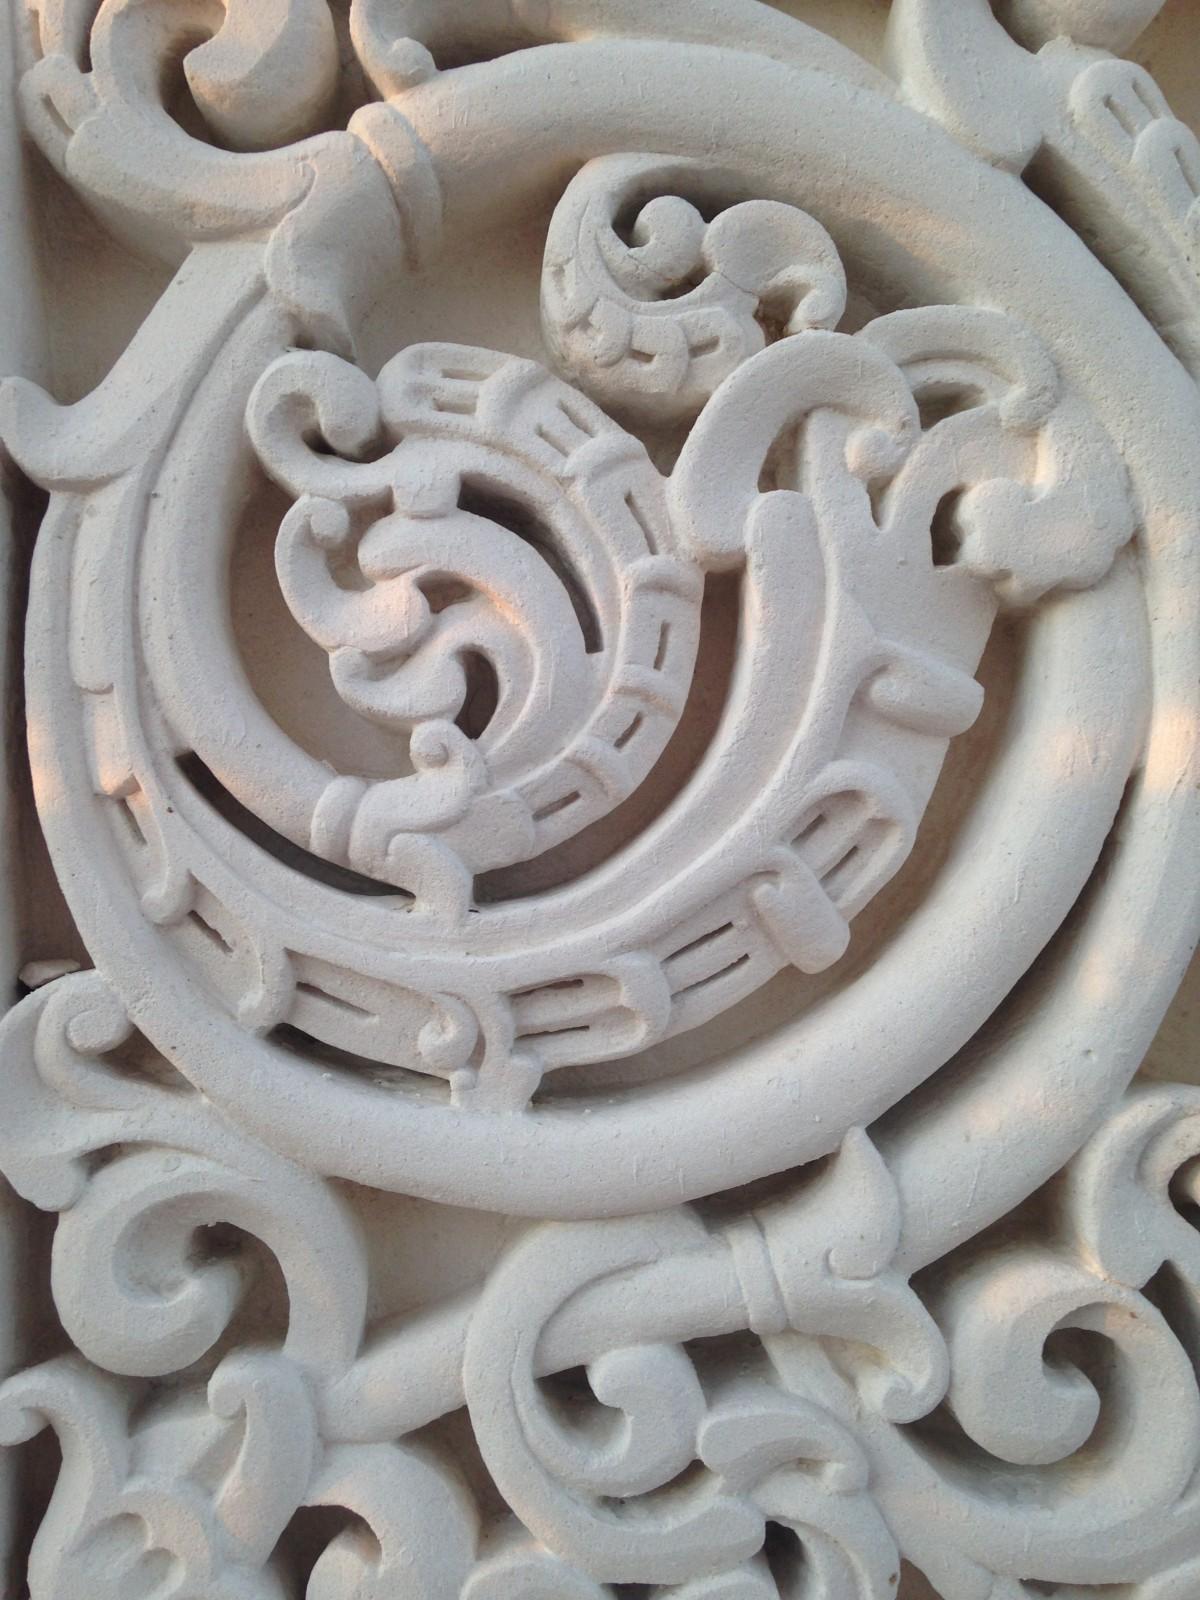 Free Images Texture Spiral Ceramic Material